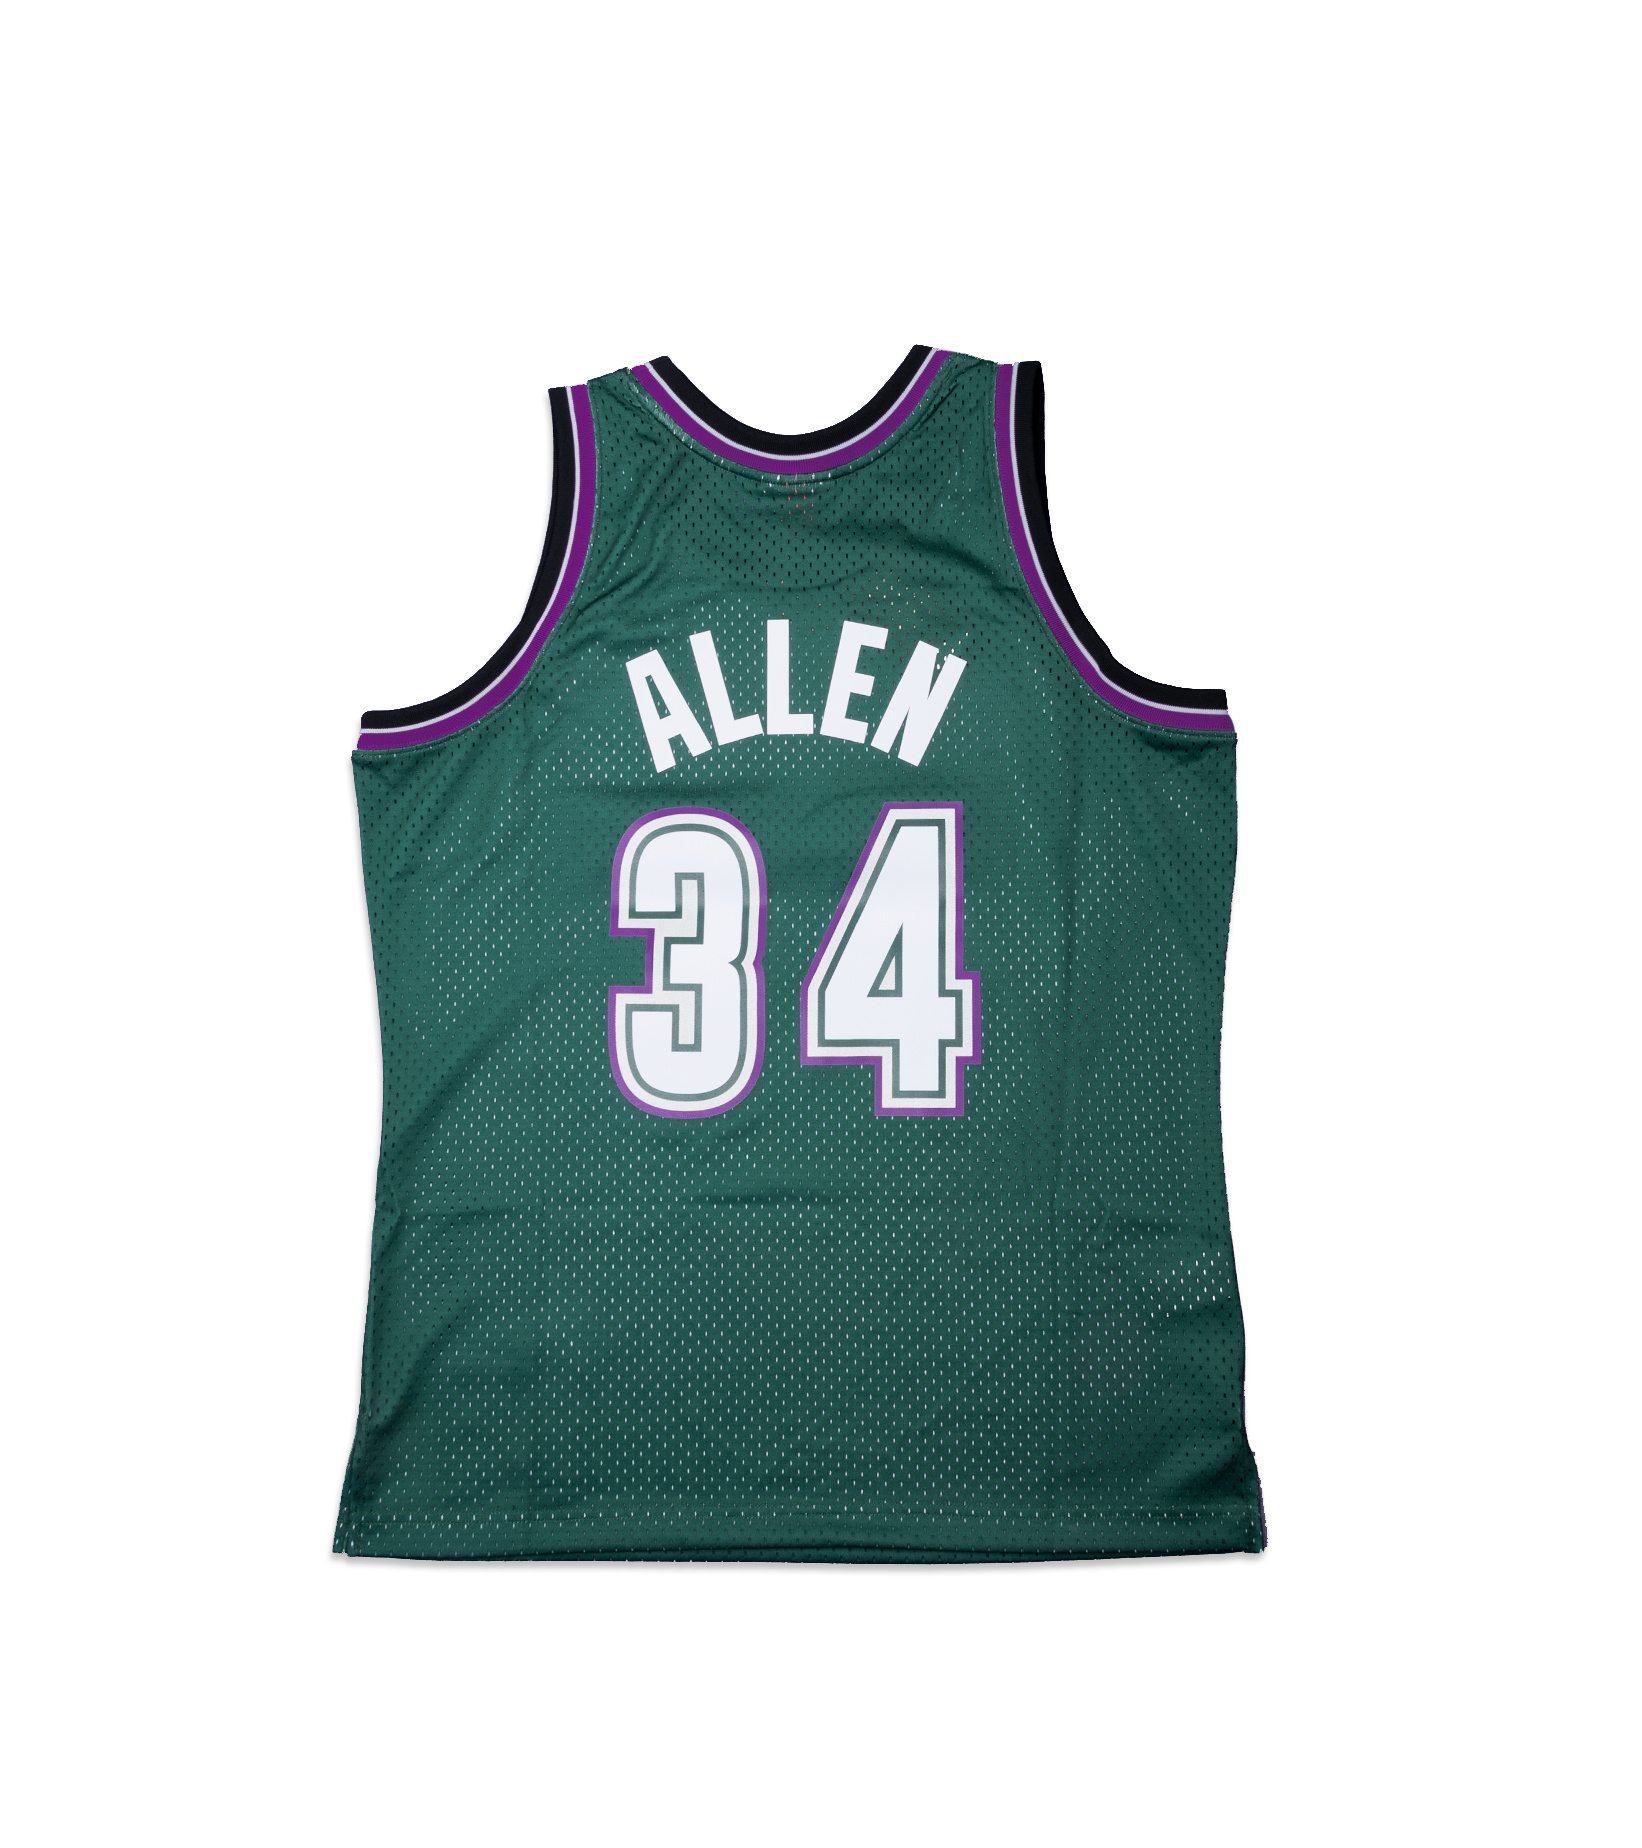 "Milwaukee Bucks '96-'97 R. Allen Swingman Jersey ""Dark Green""-5"